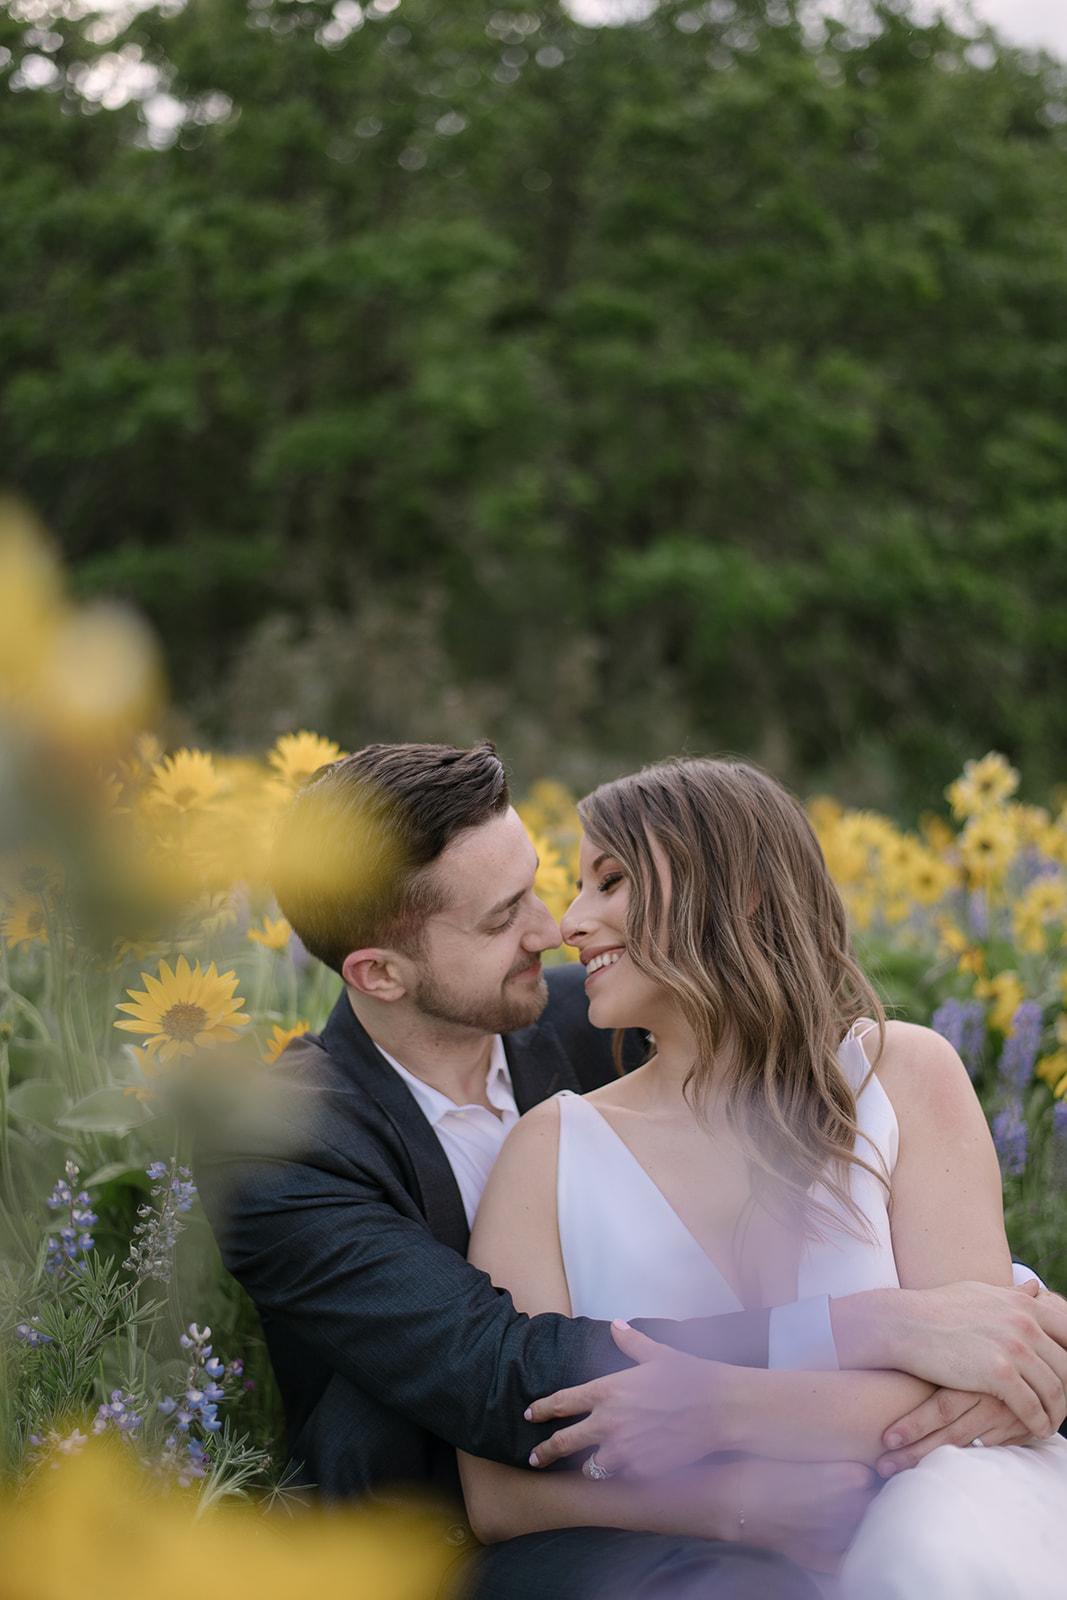 kamea_events_wedding_planner_portland_DeusAmor41.jpg